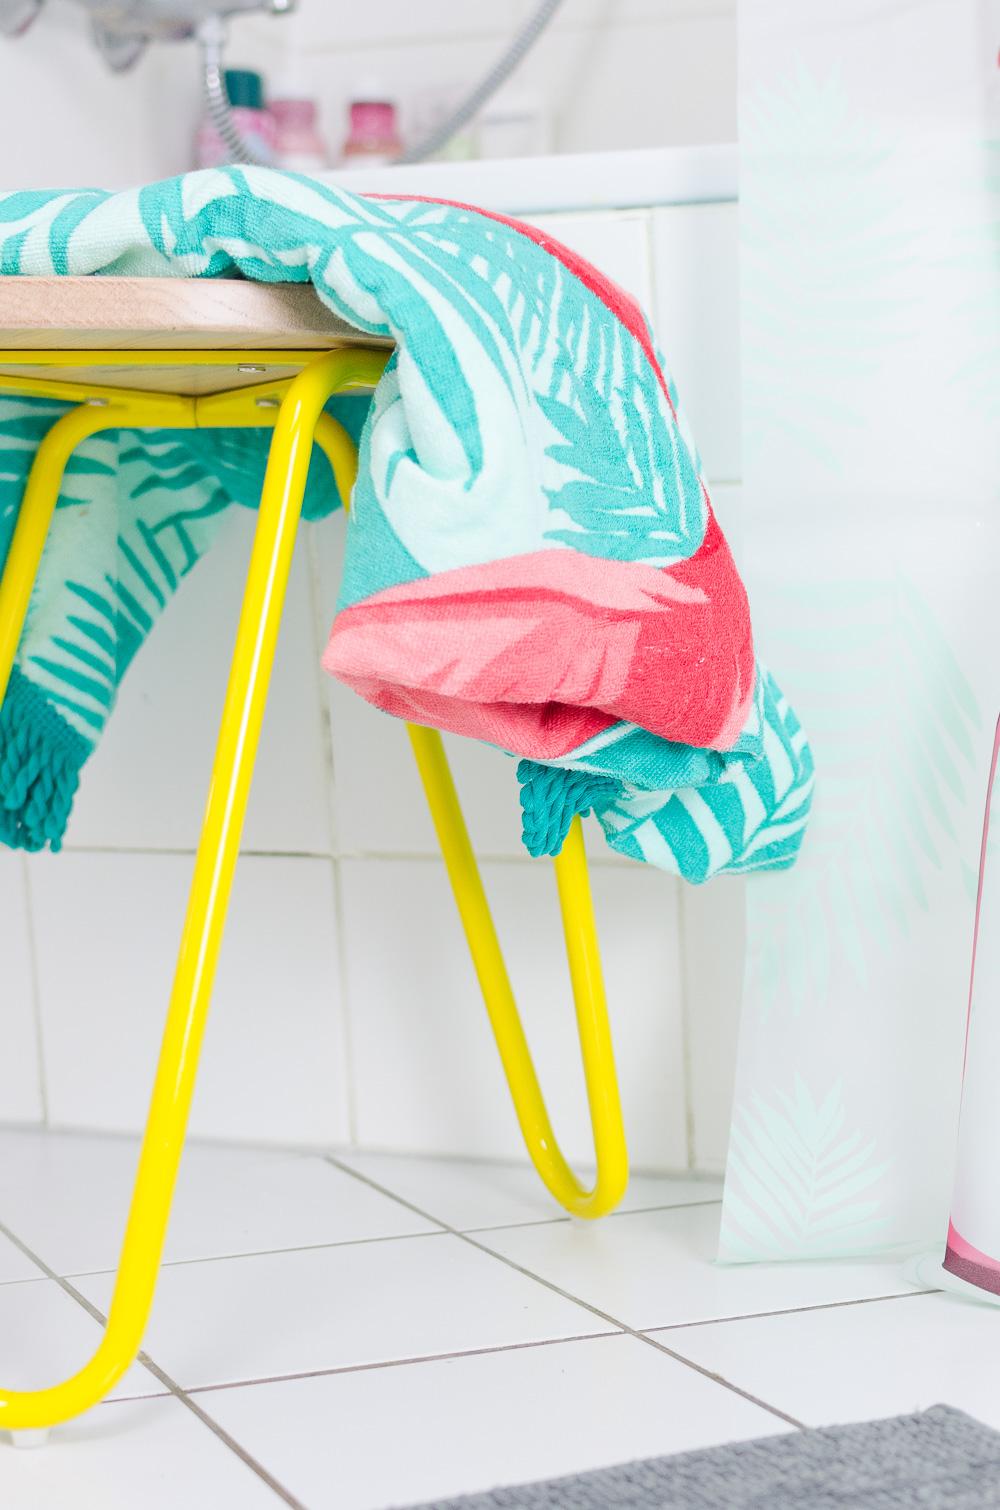 mein badezimmer welcome to miami mit tchibo. Black Bedroom Furniture Sets. Home Design Ideas